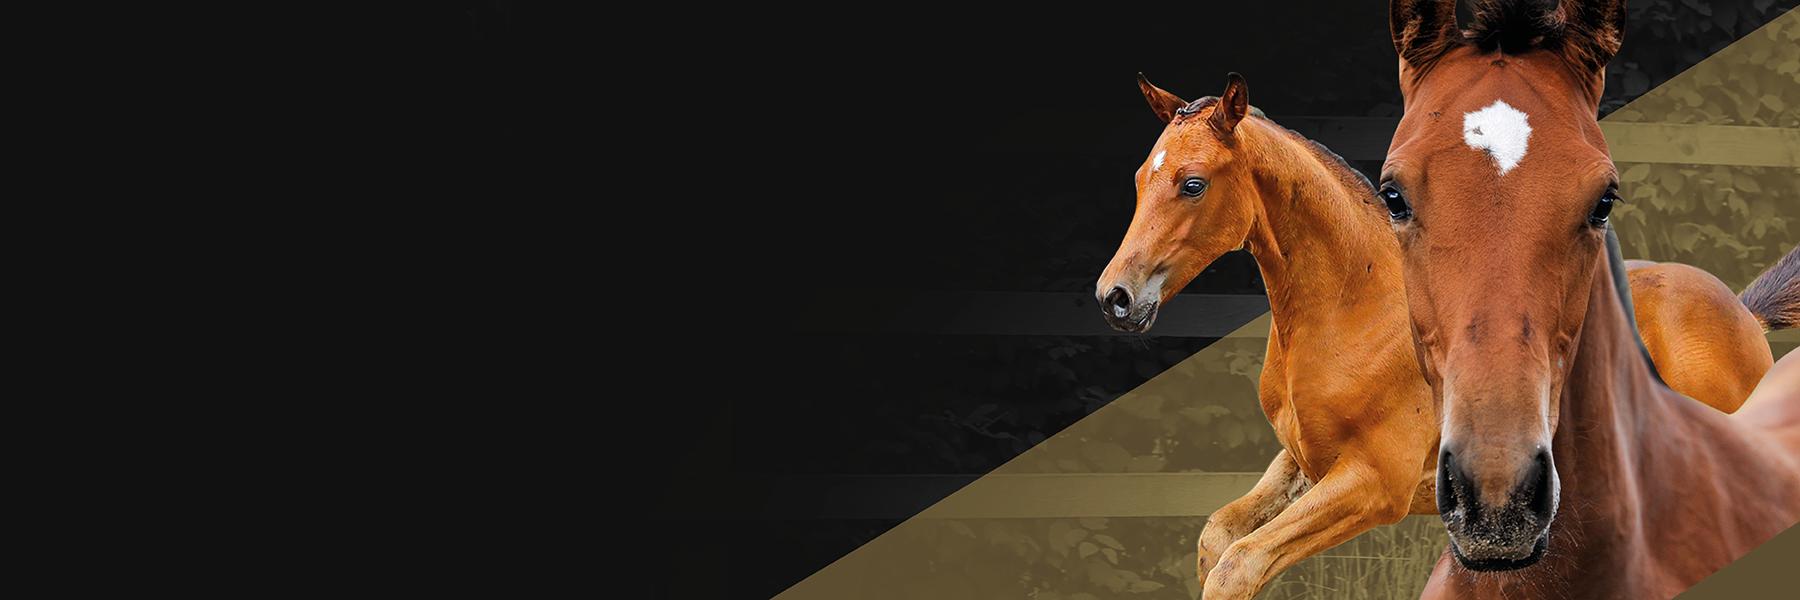 Online Foal Auction 2021